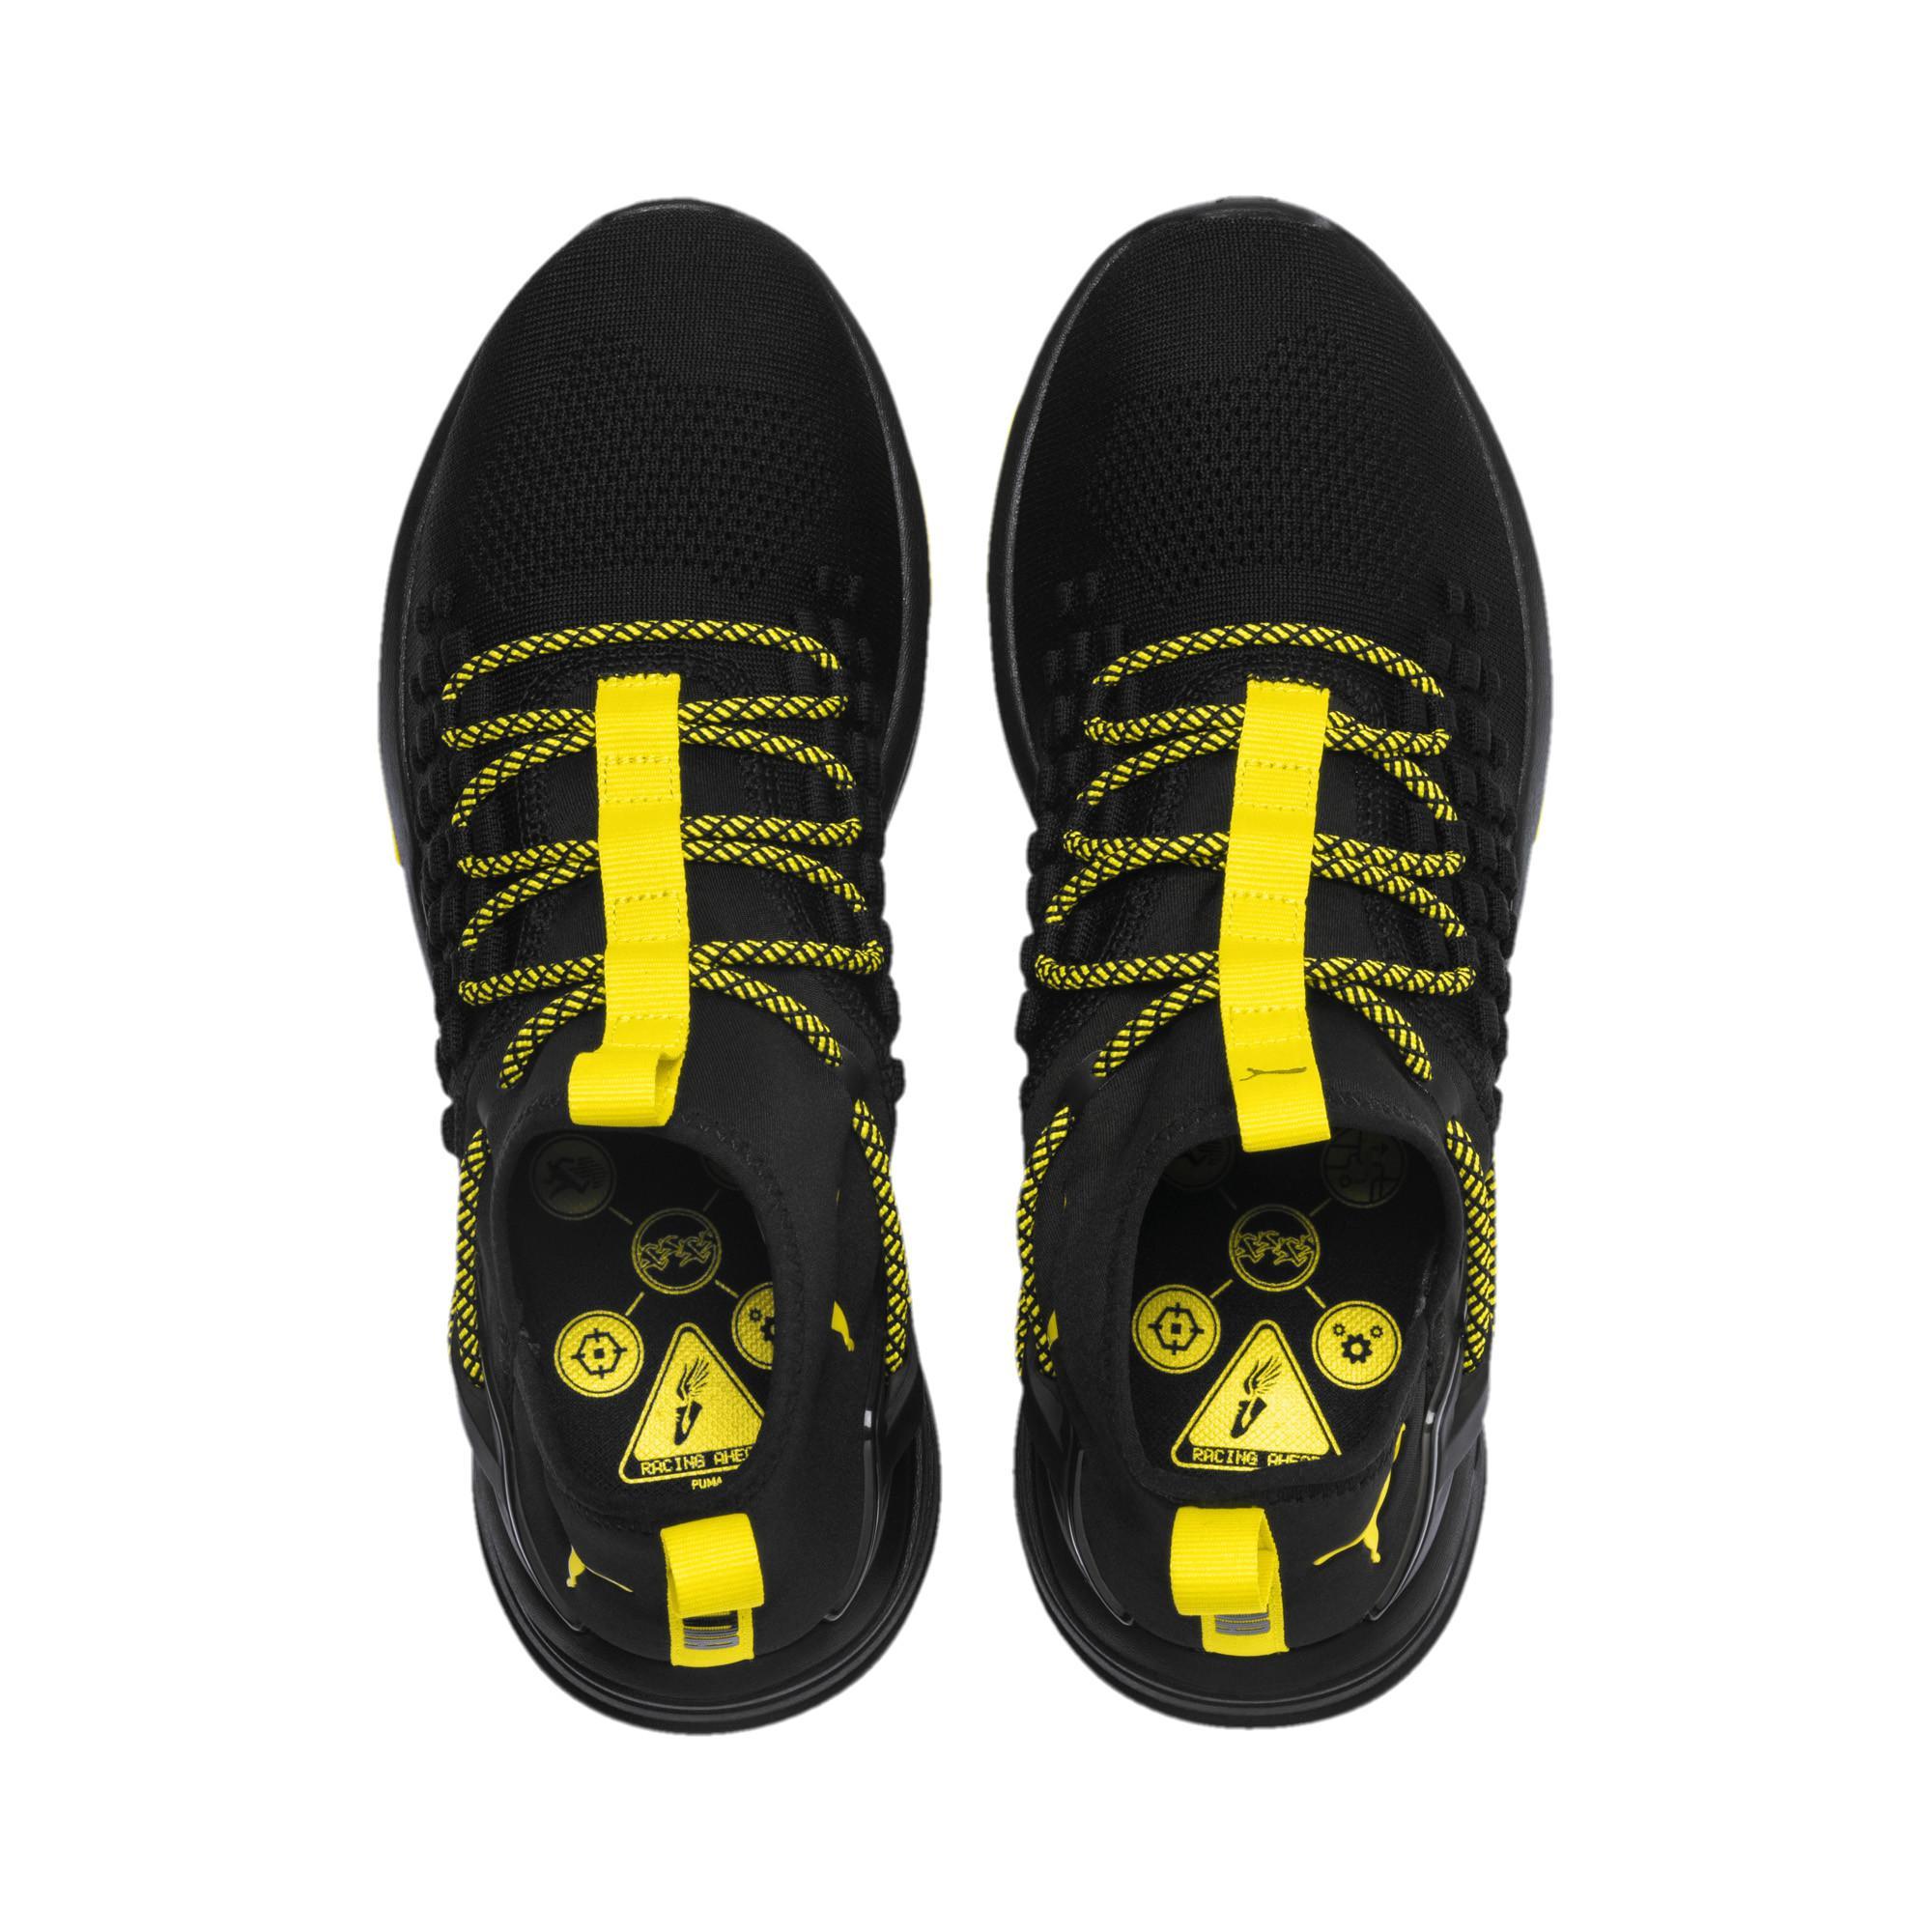 8b9cb54ce652f PUMA - Black Mantra Caution Men s Training Shoes for Men - Lyst. View  fullscreen